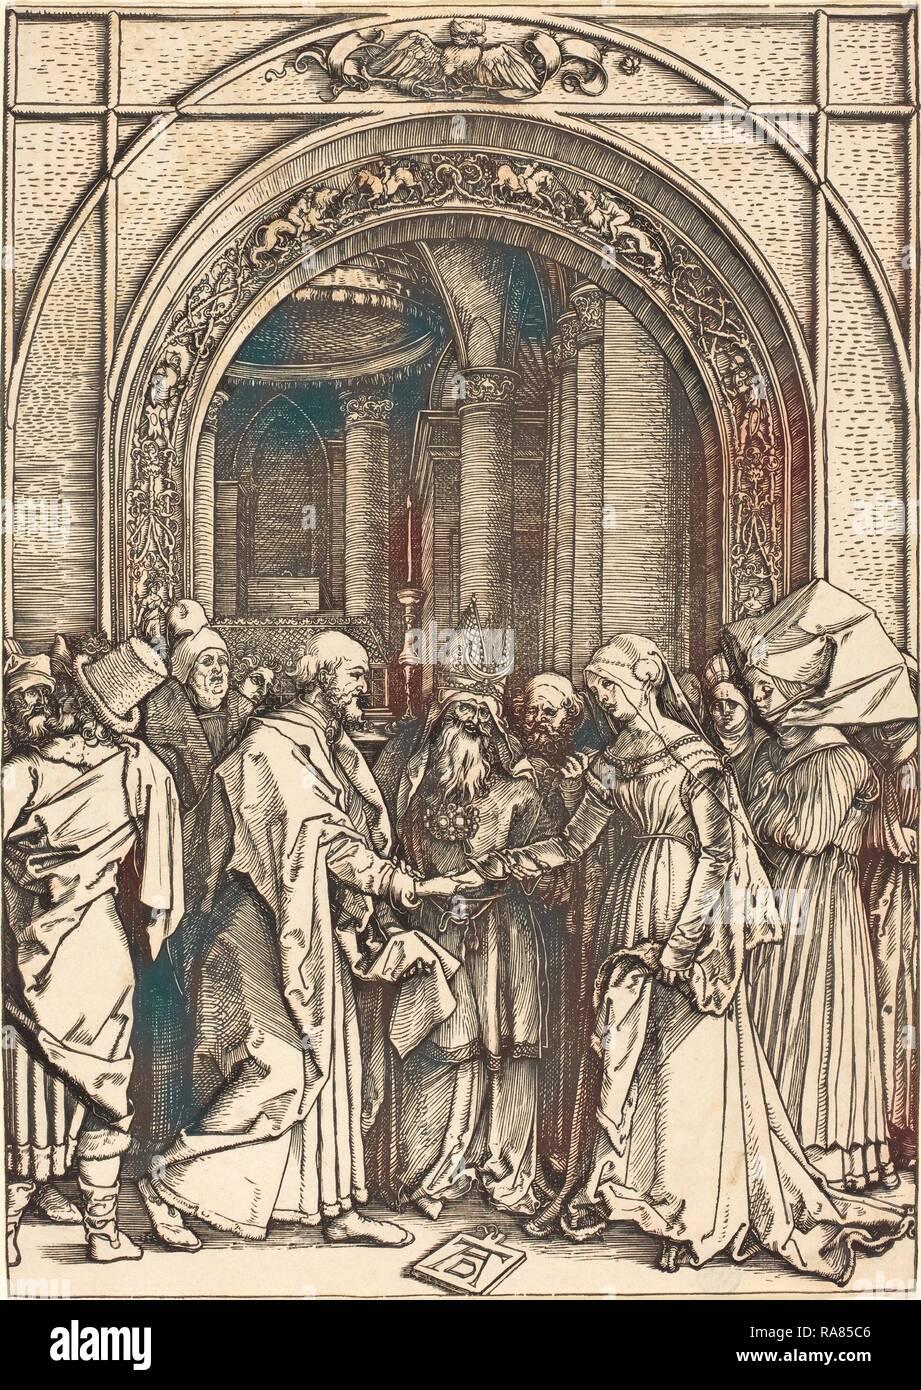 Albrecht Dürer (1471 - 1528), die Verlobung der Heiligen Jungfrau, C. 1504-1505, Holzschnitt. Neuerfundene Stockbild